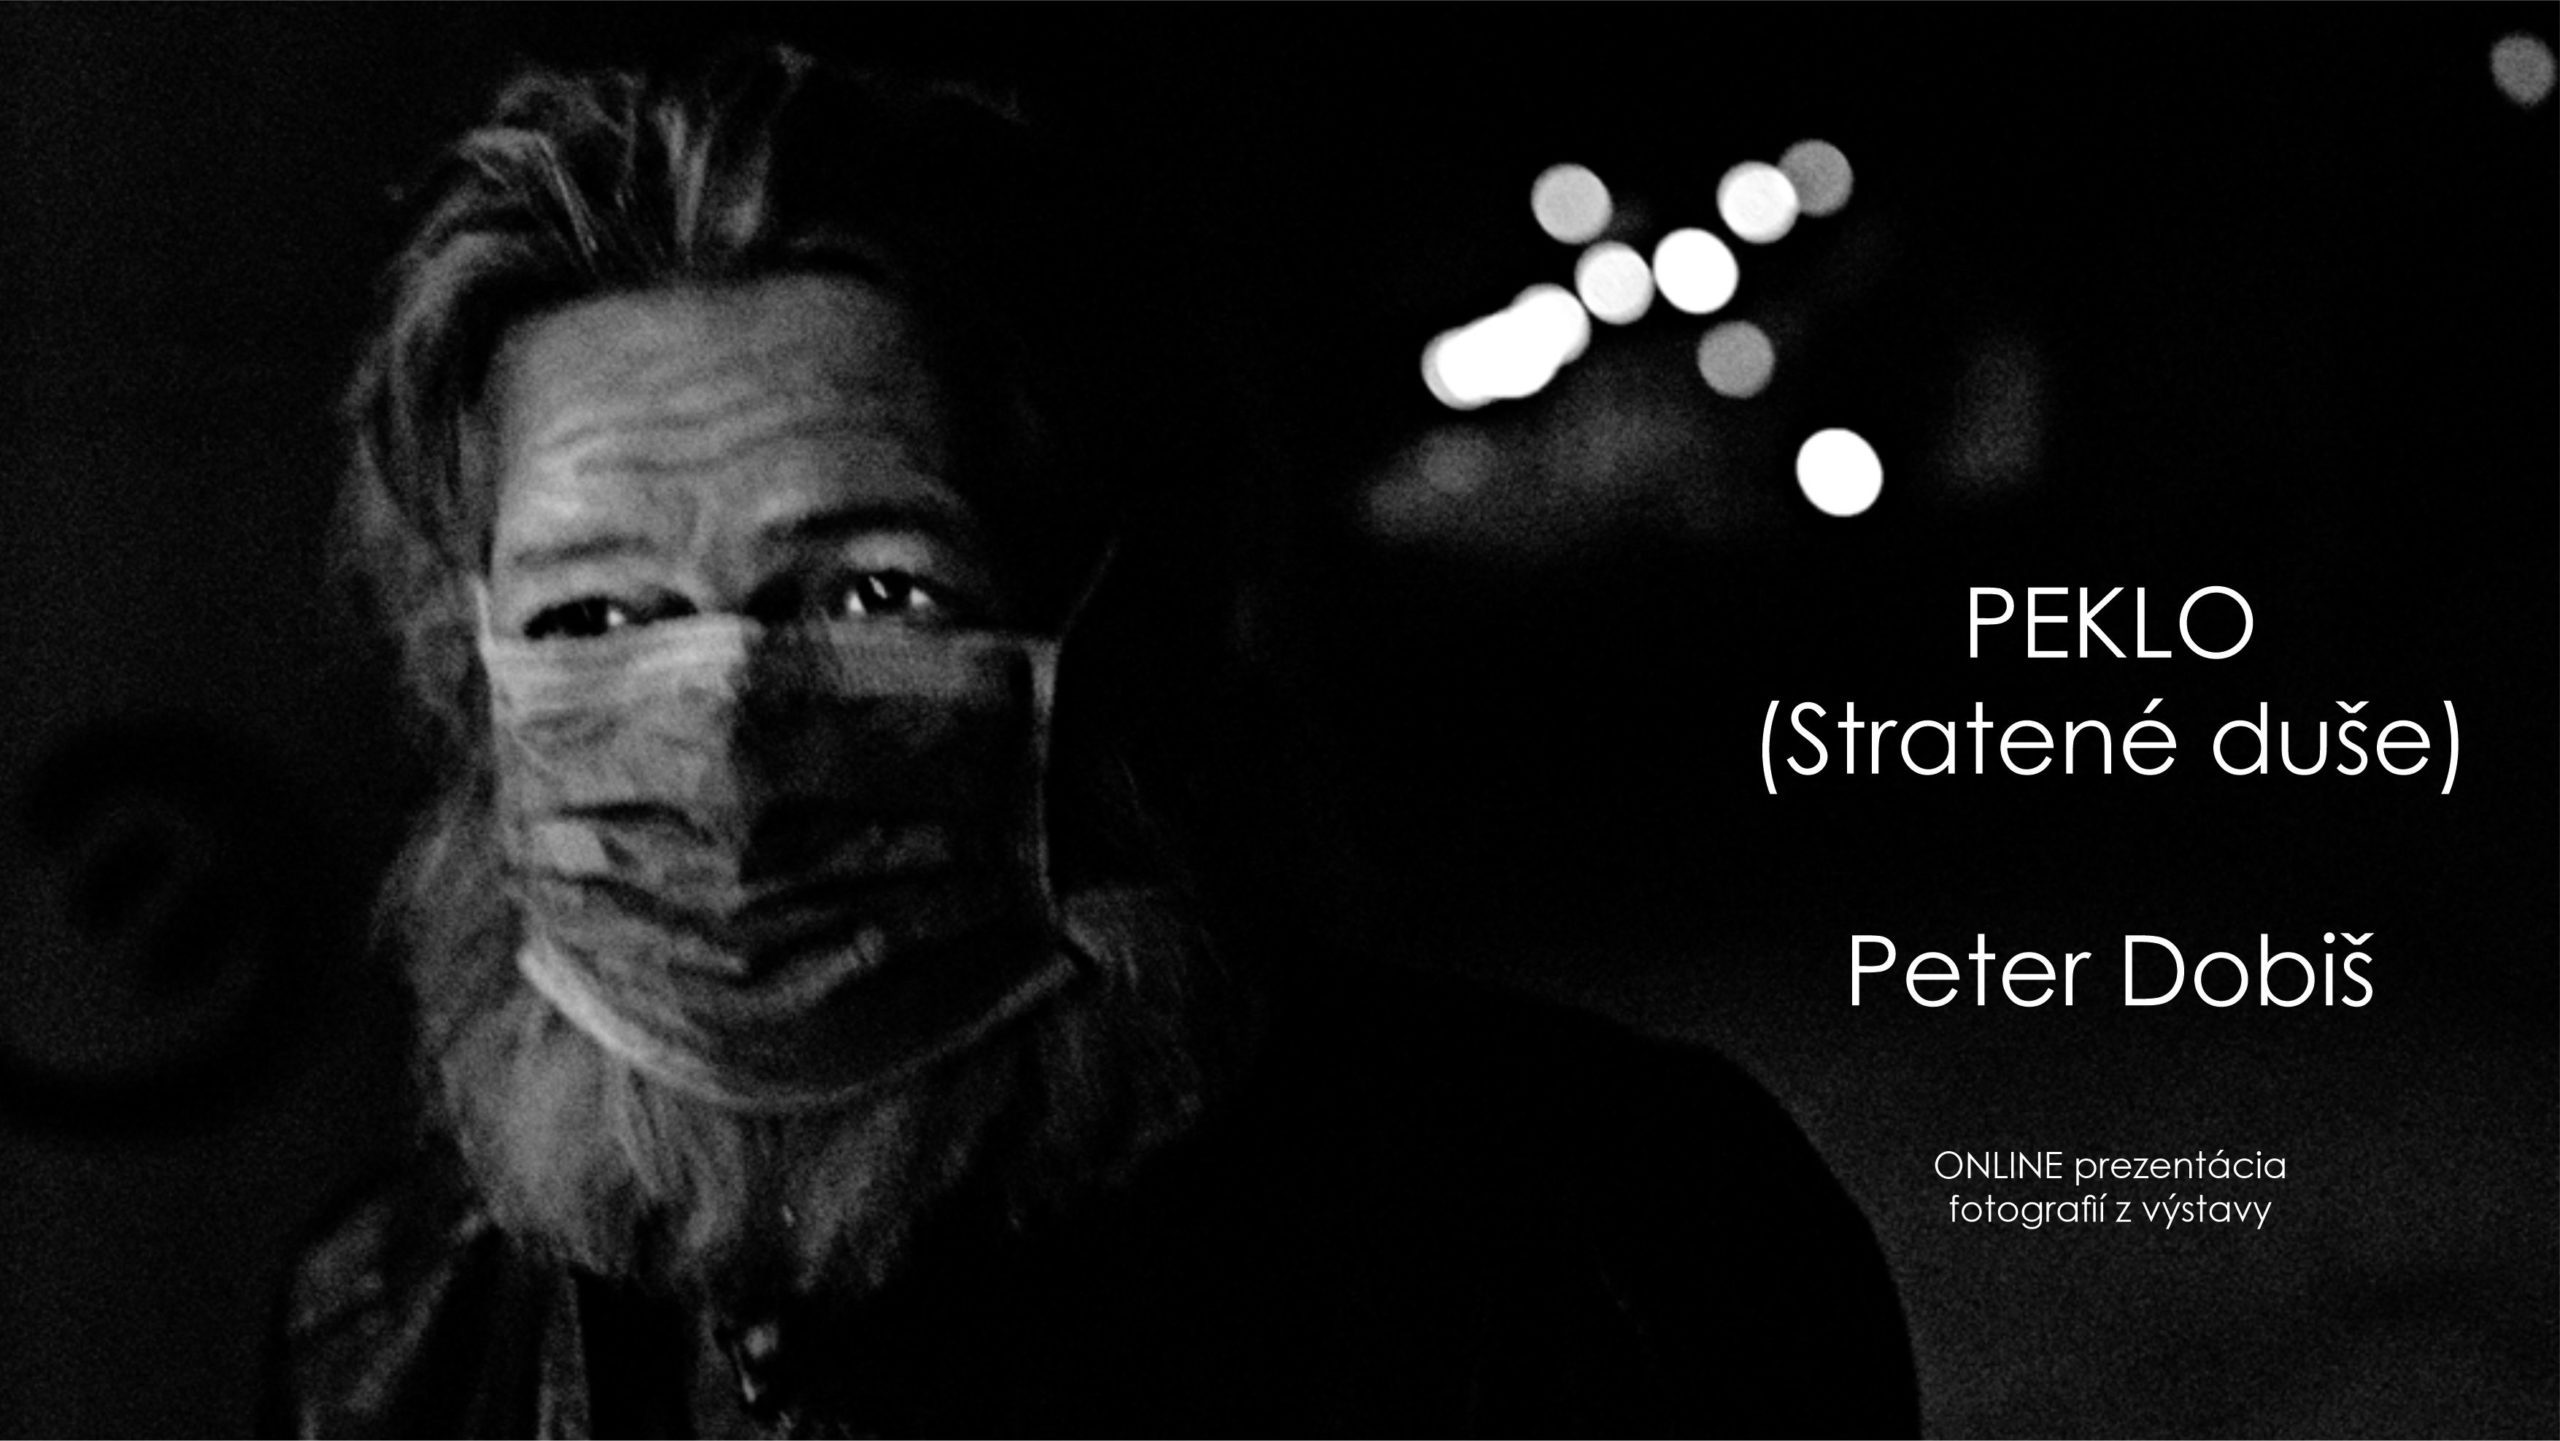 Peklo Peter Dobiš – ONLINE výstava